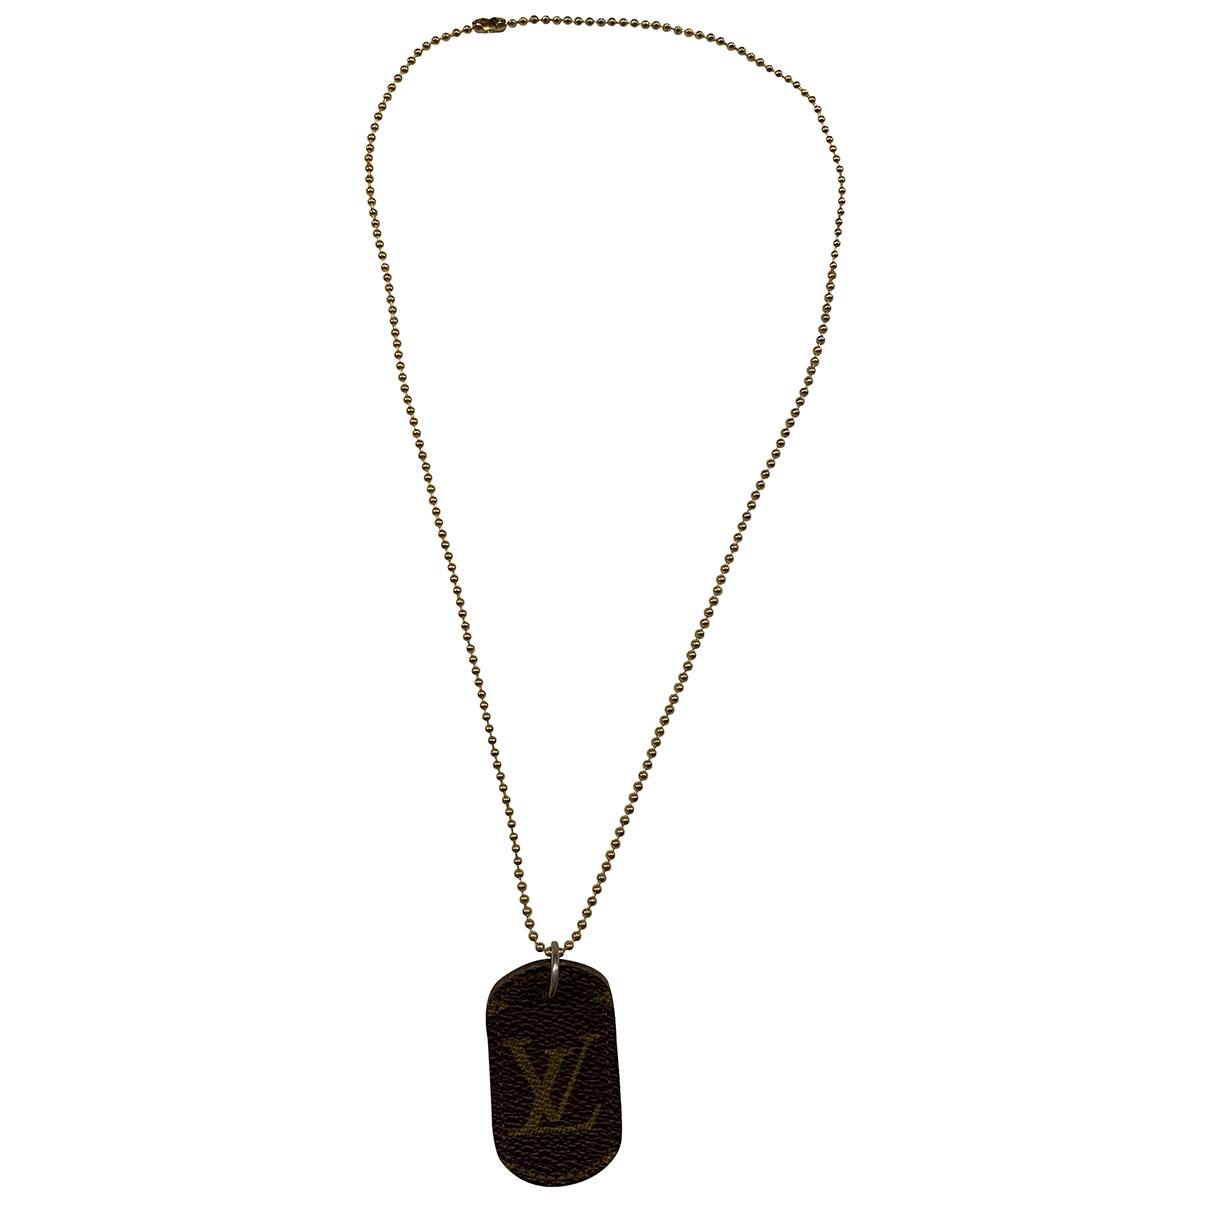 Collar Monogram de Cuero Louis Vuitton